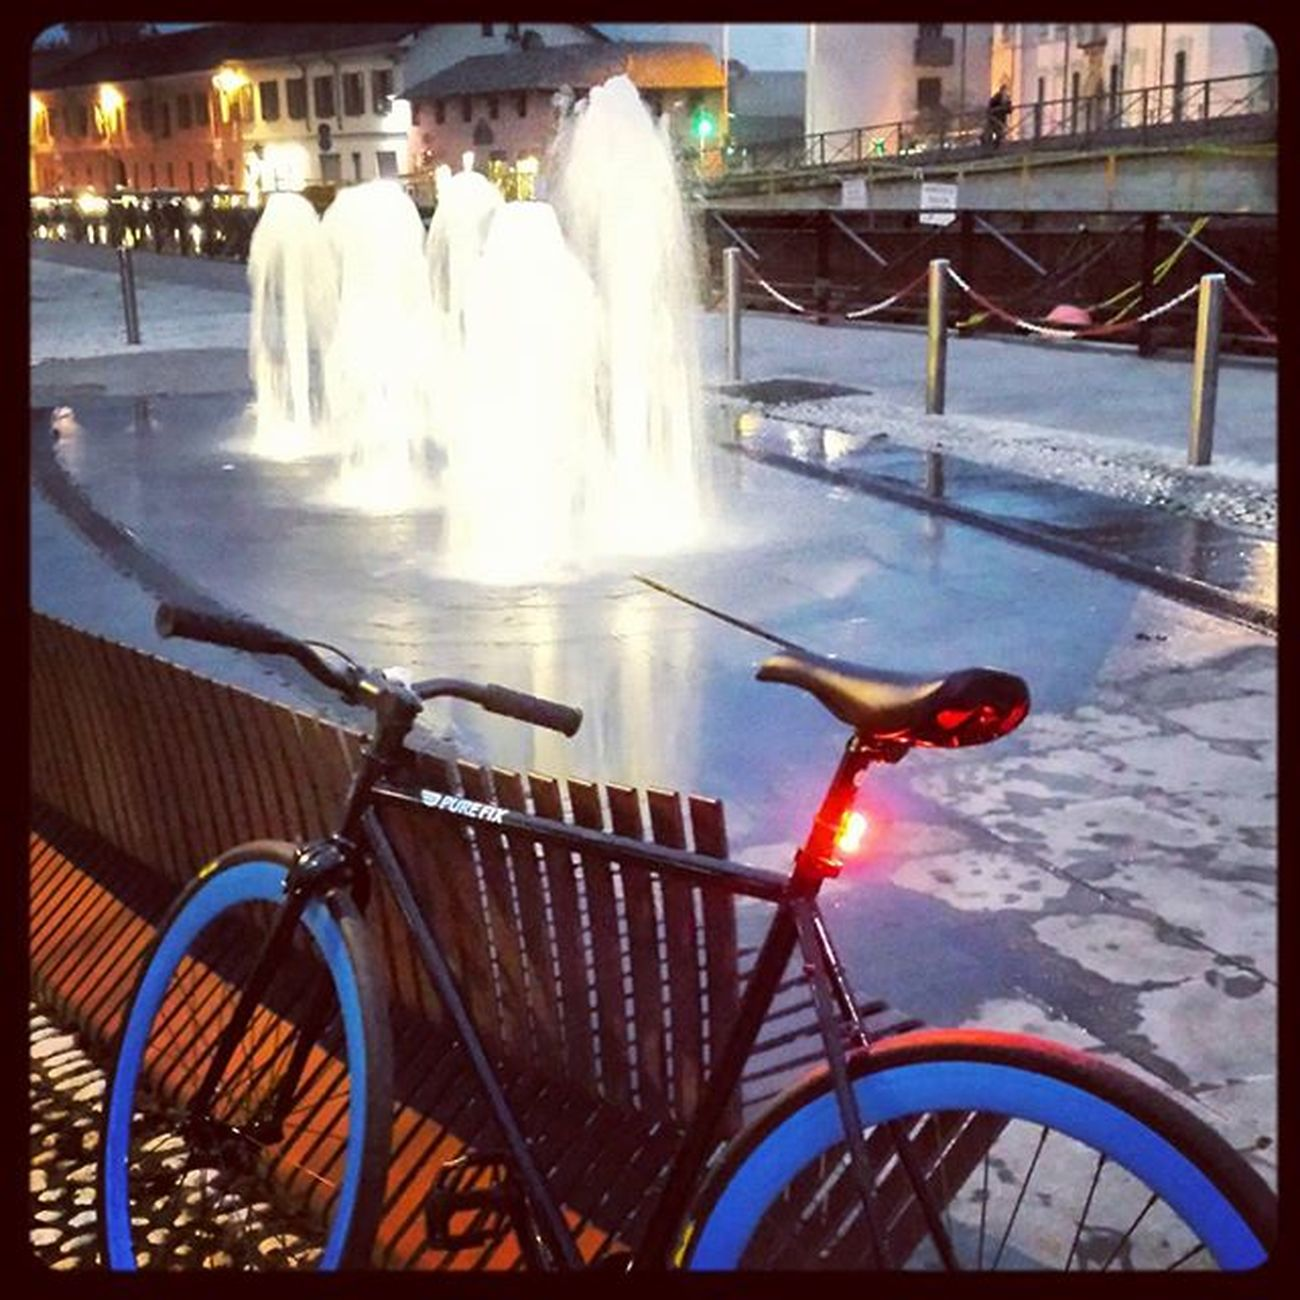 Gaggiano Runtastic Sgambata Bike Ride Biking Insta_bikers Colinstrickland Vengoaprenderti Olmobike Labiciclissima Miasorellamiinsulta Withthelightsout Itslessdangerous